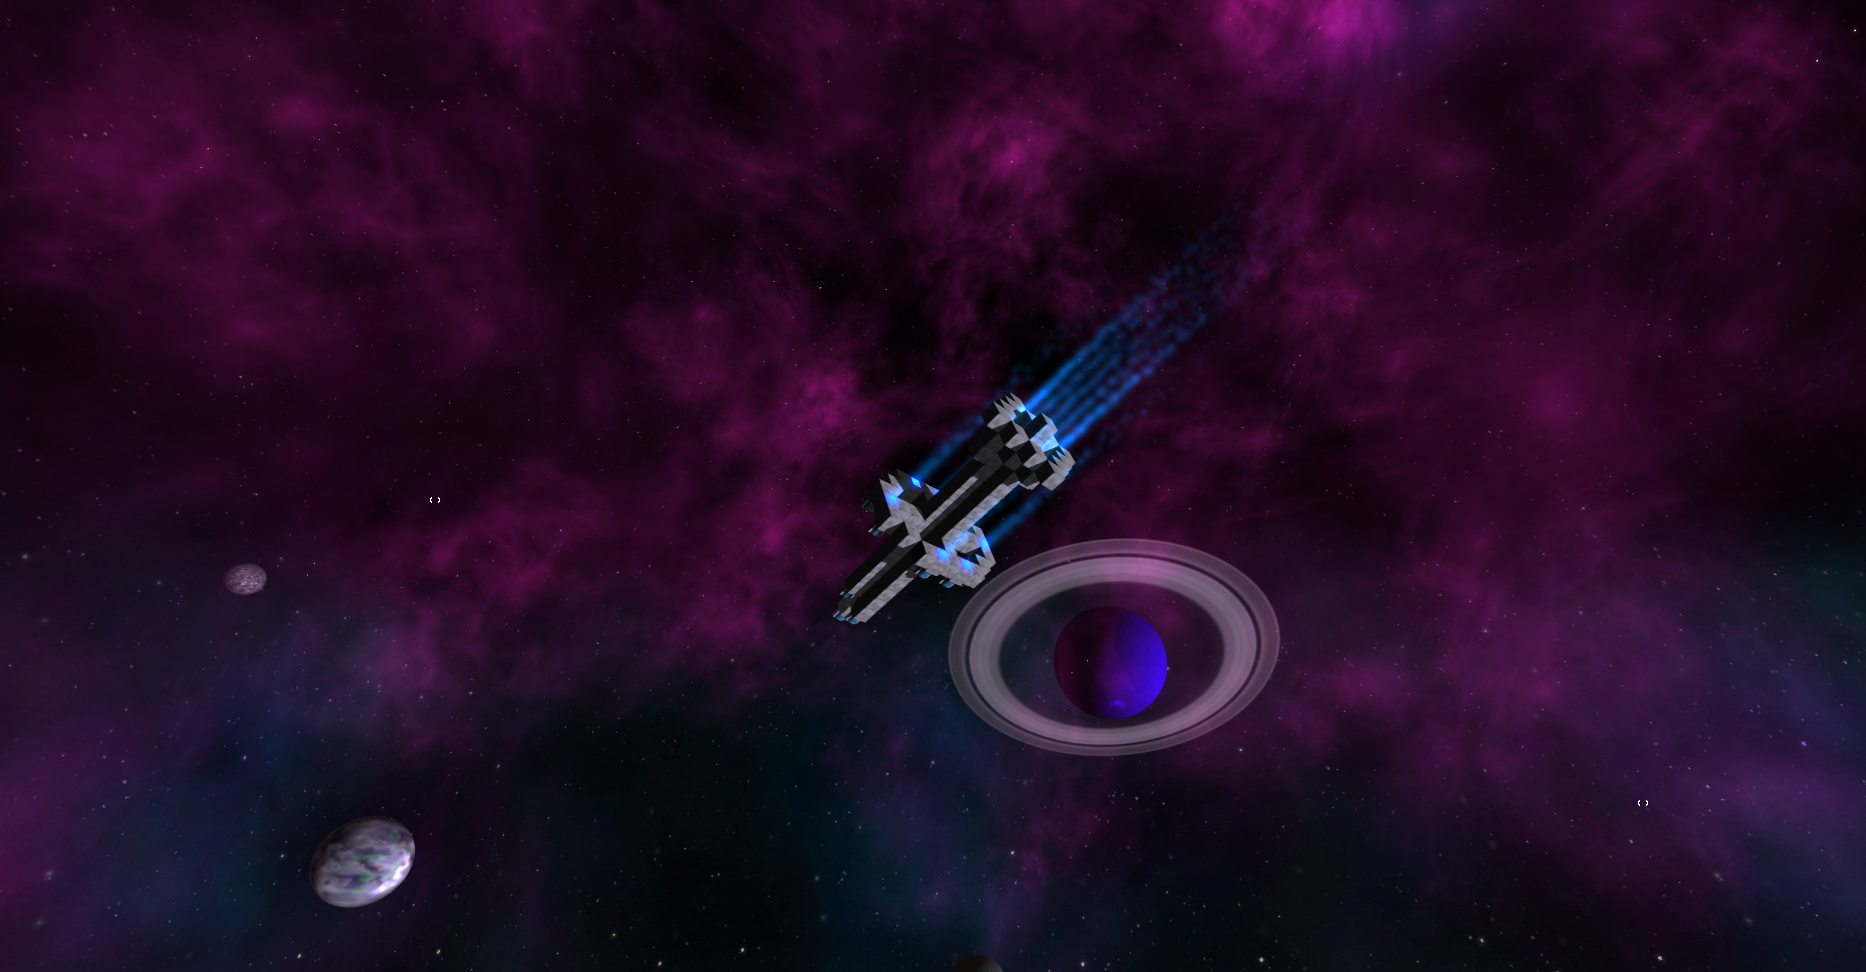 Prometheus flyby of a purple nebula